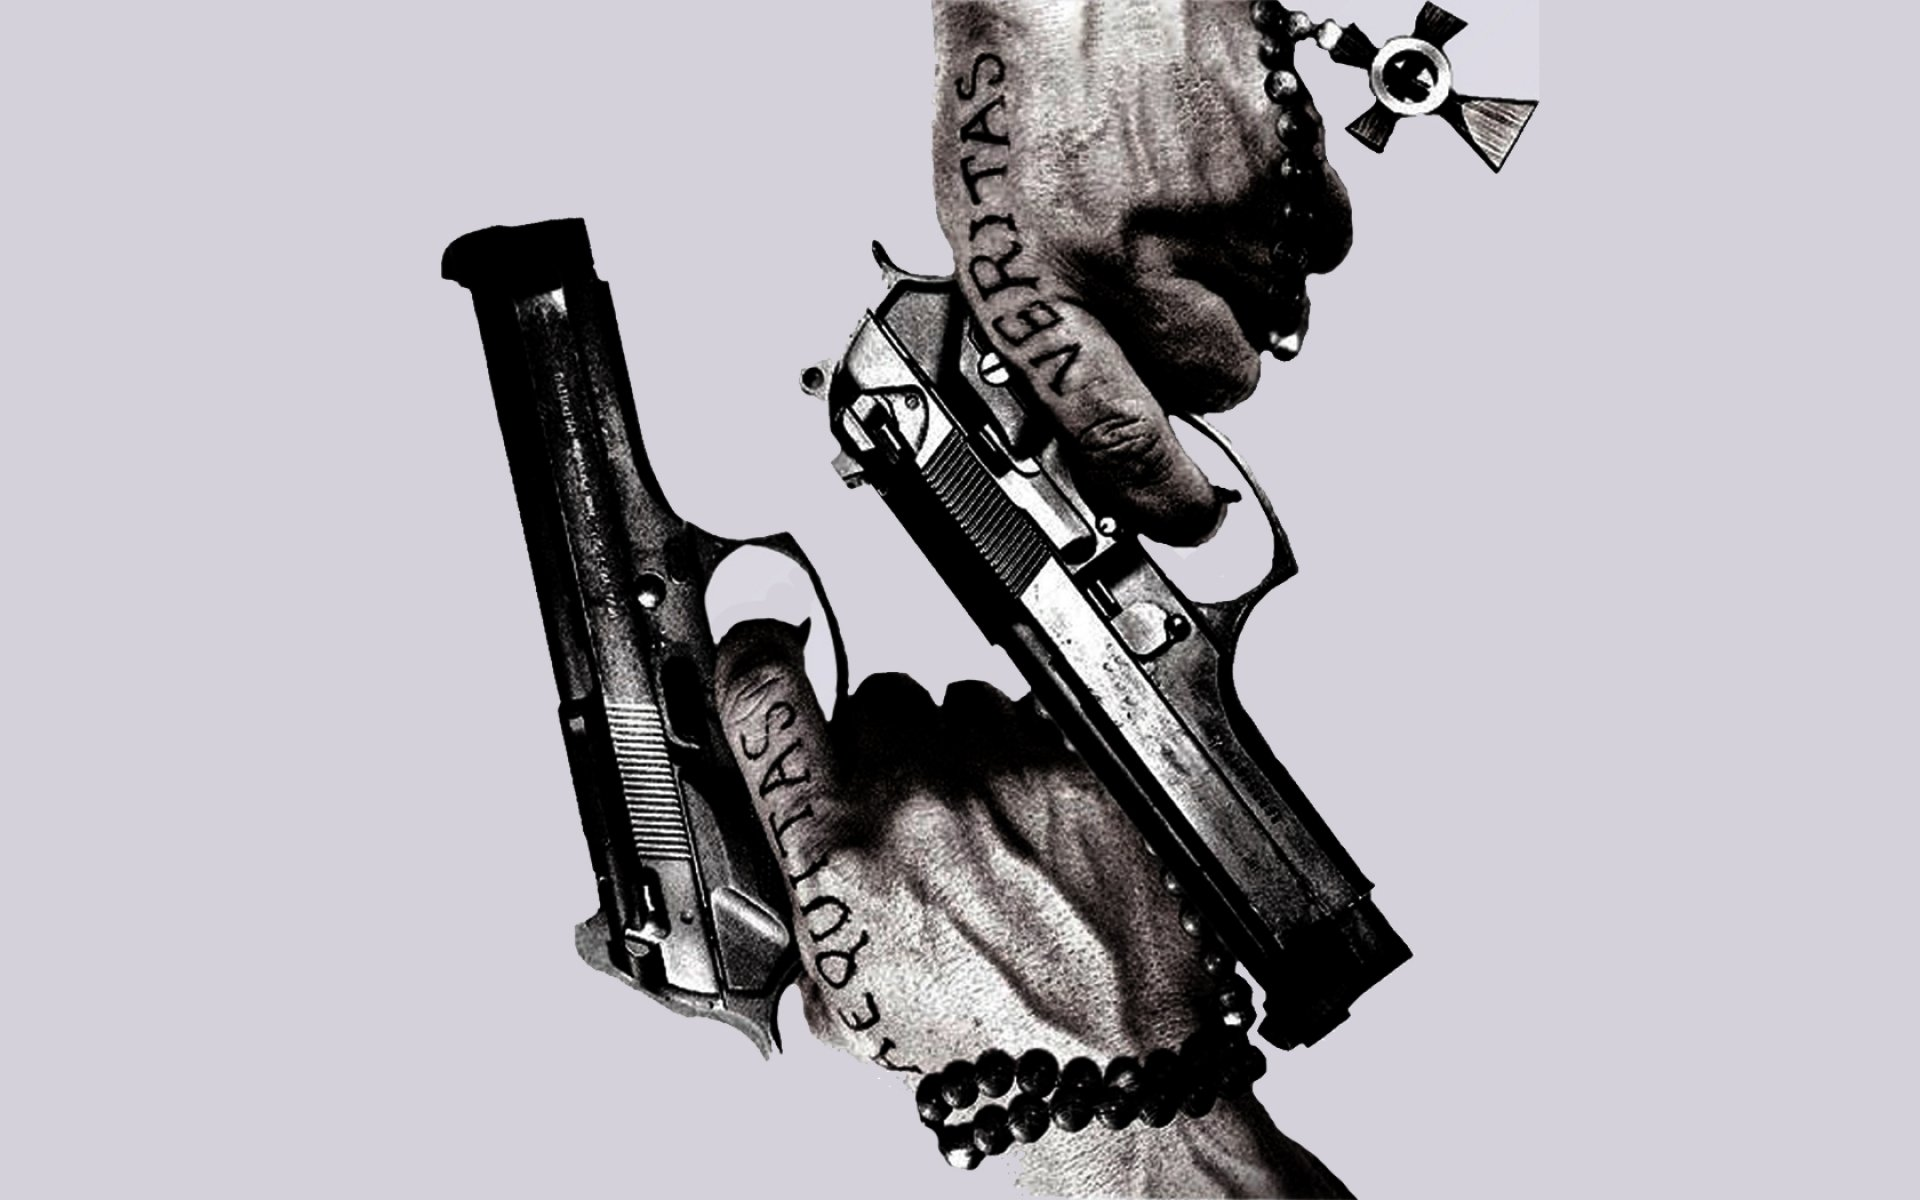 boondock saints action crime thriller weapon gun pistol